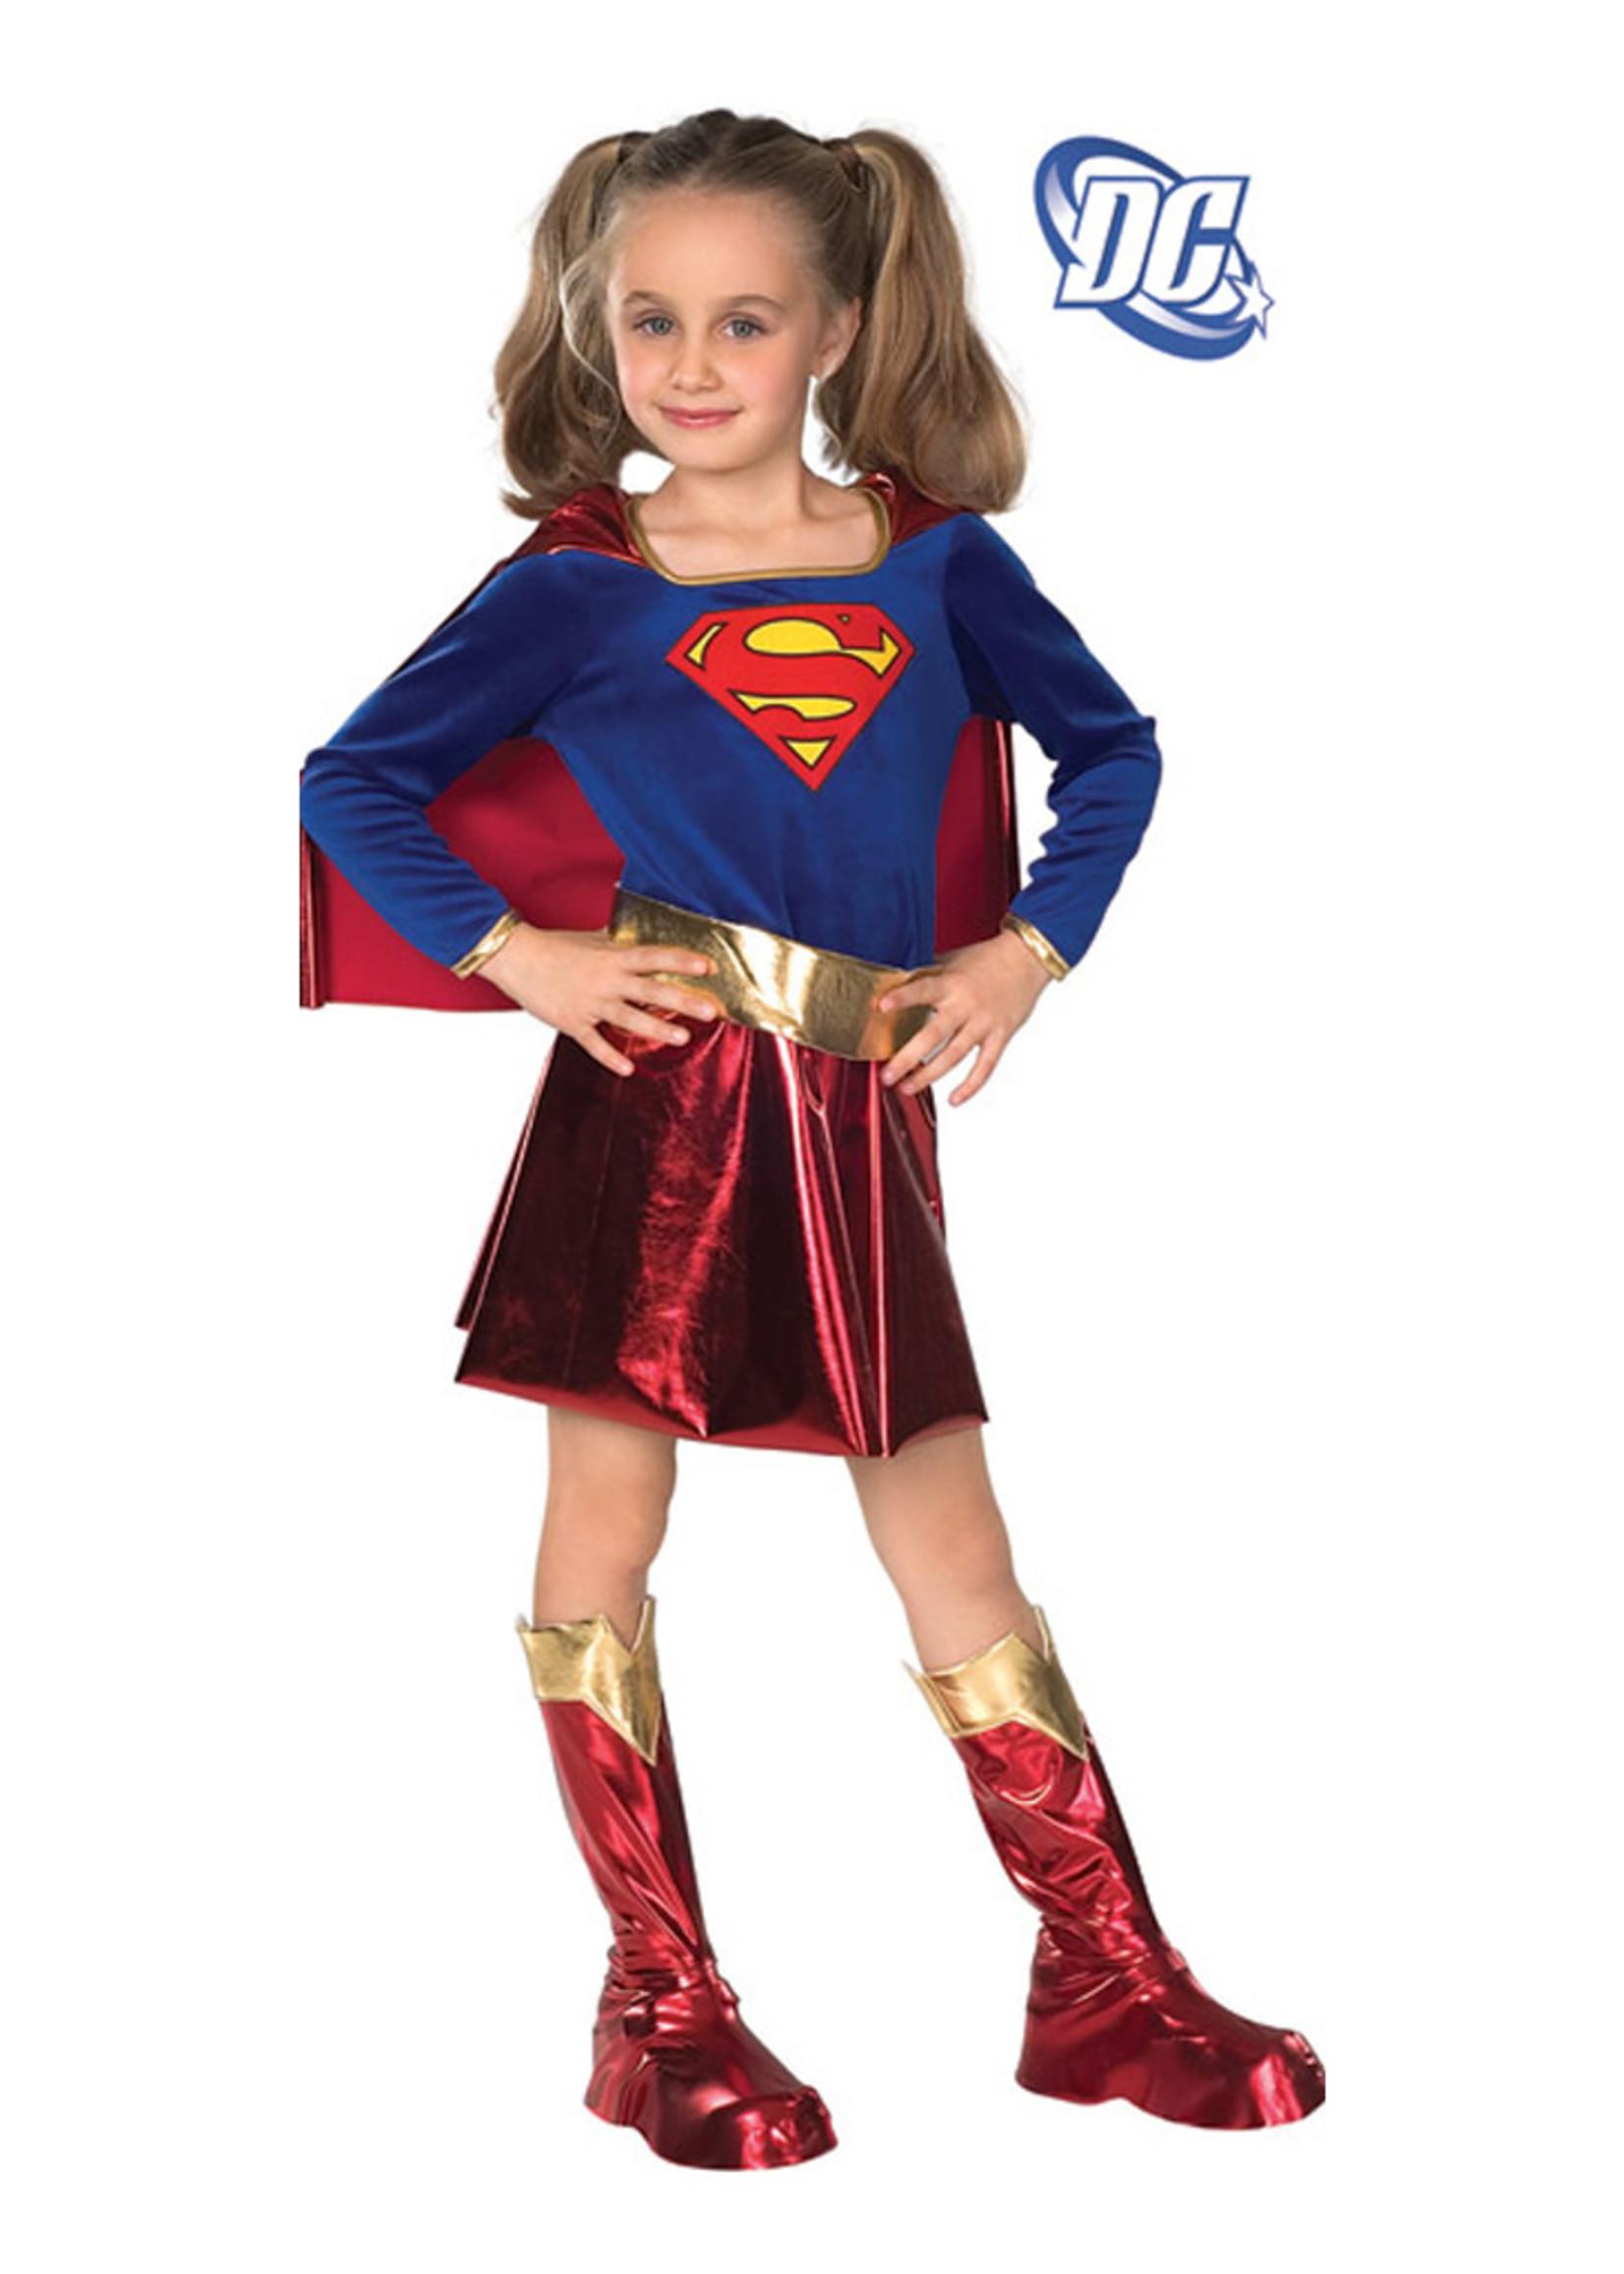 Supergirl Costume - Girls